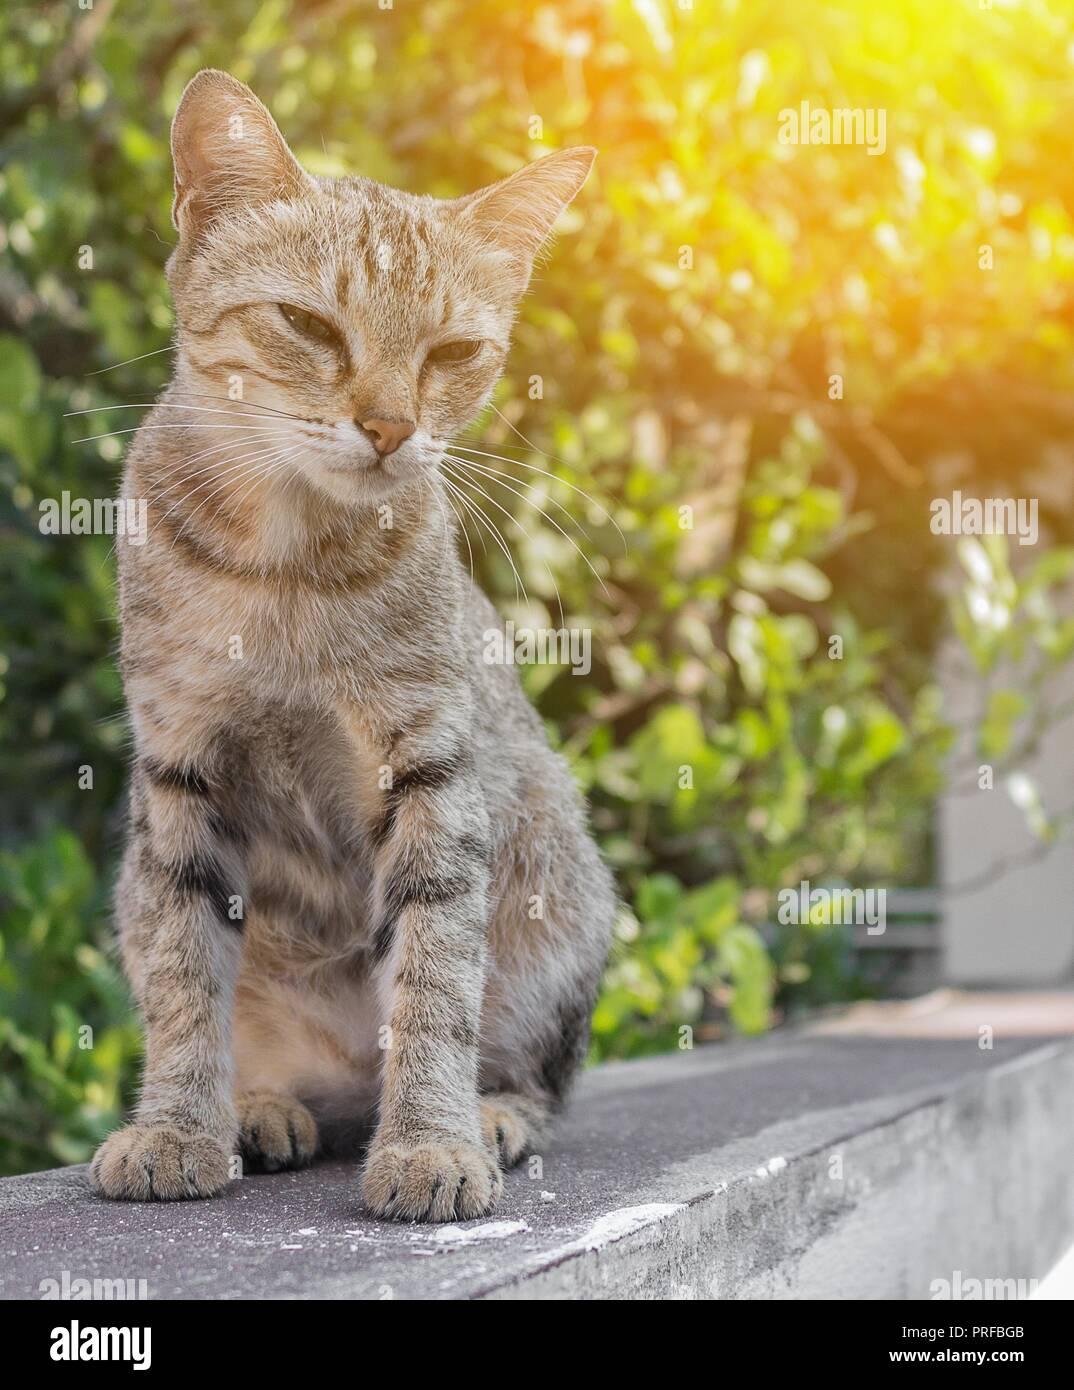 Gato, gris con tristes tristes ojos. y colorido fondo desenfocado con tono de luz del atardecer. Imagen De Stock